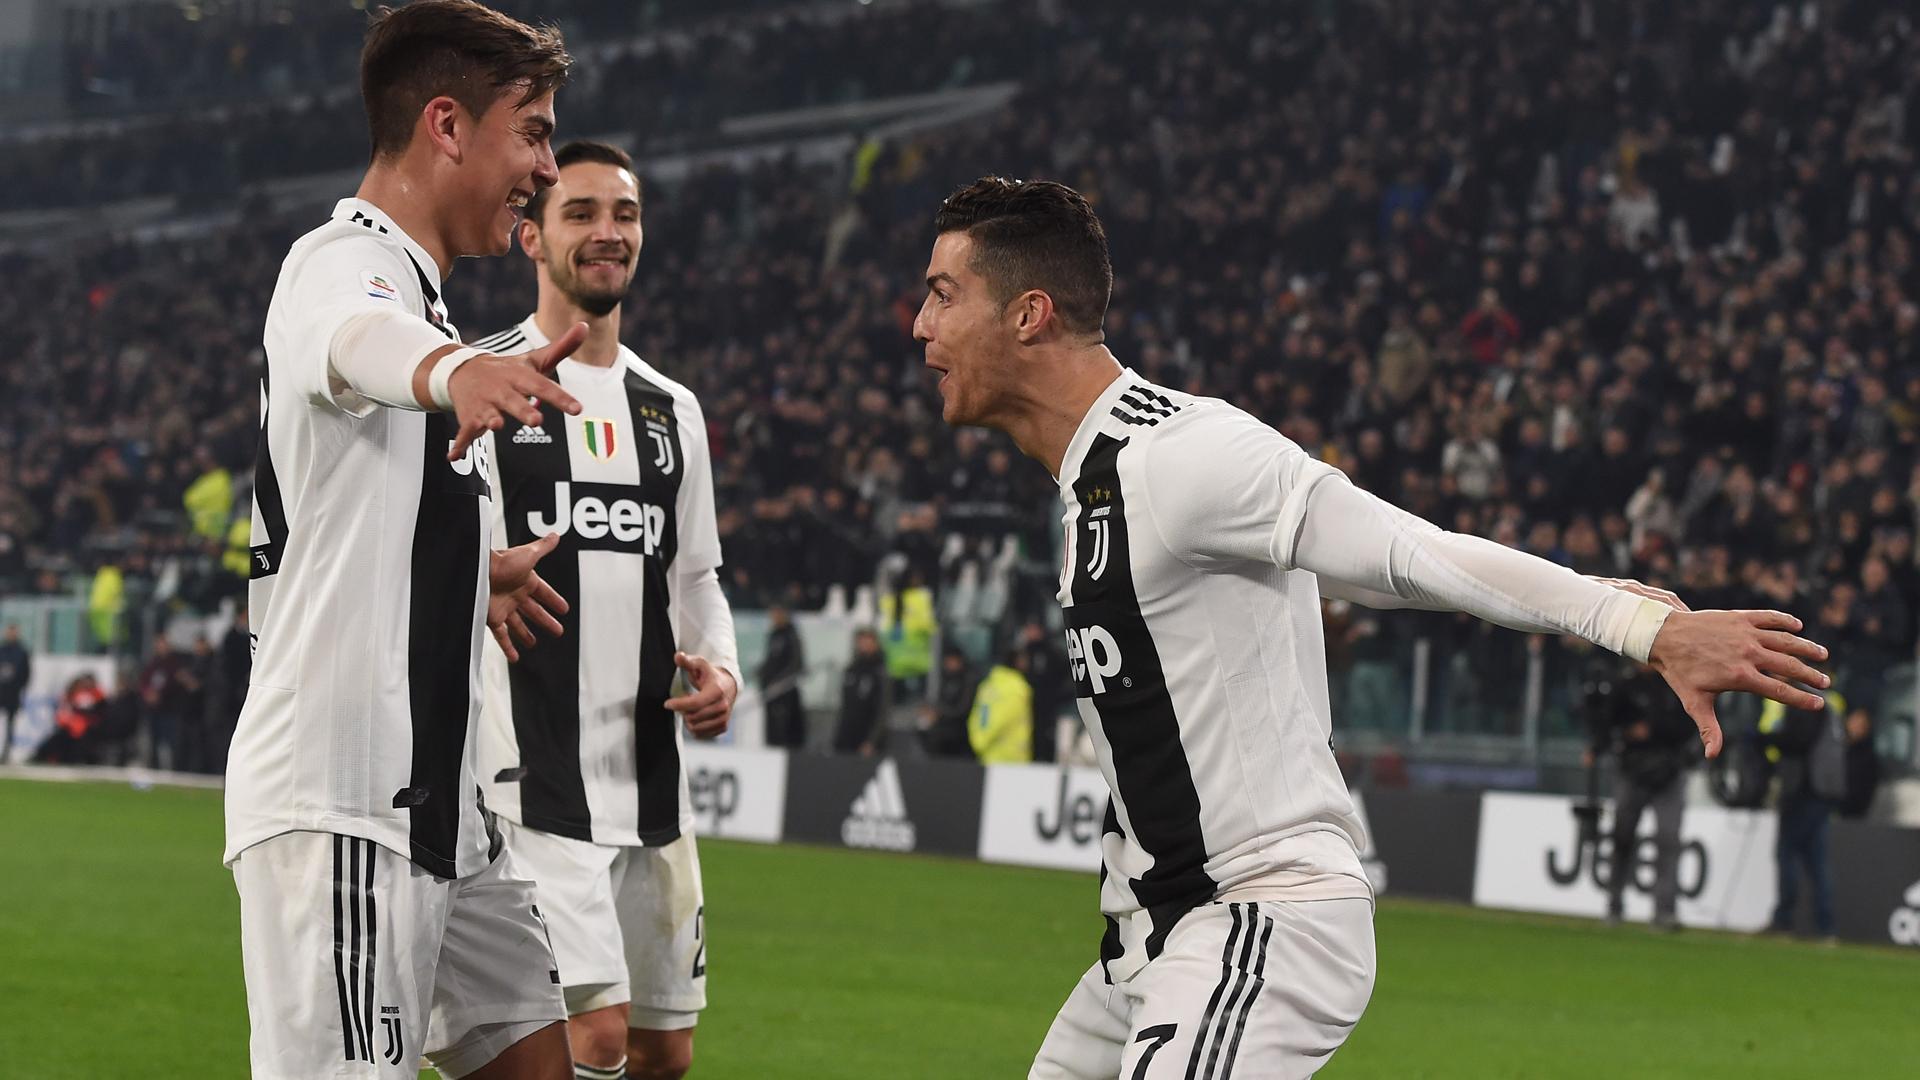 Allegri: Juve must score in Madrid